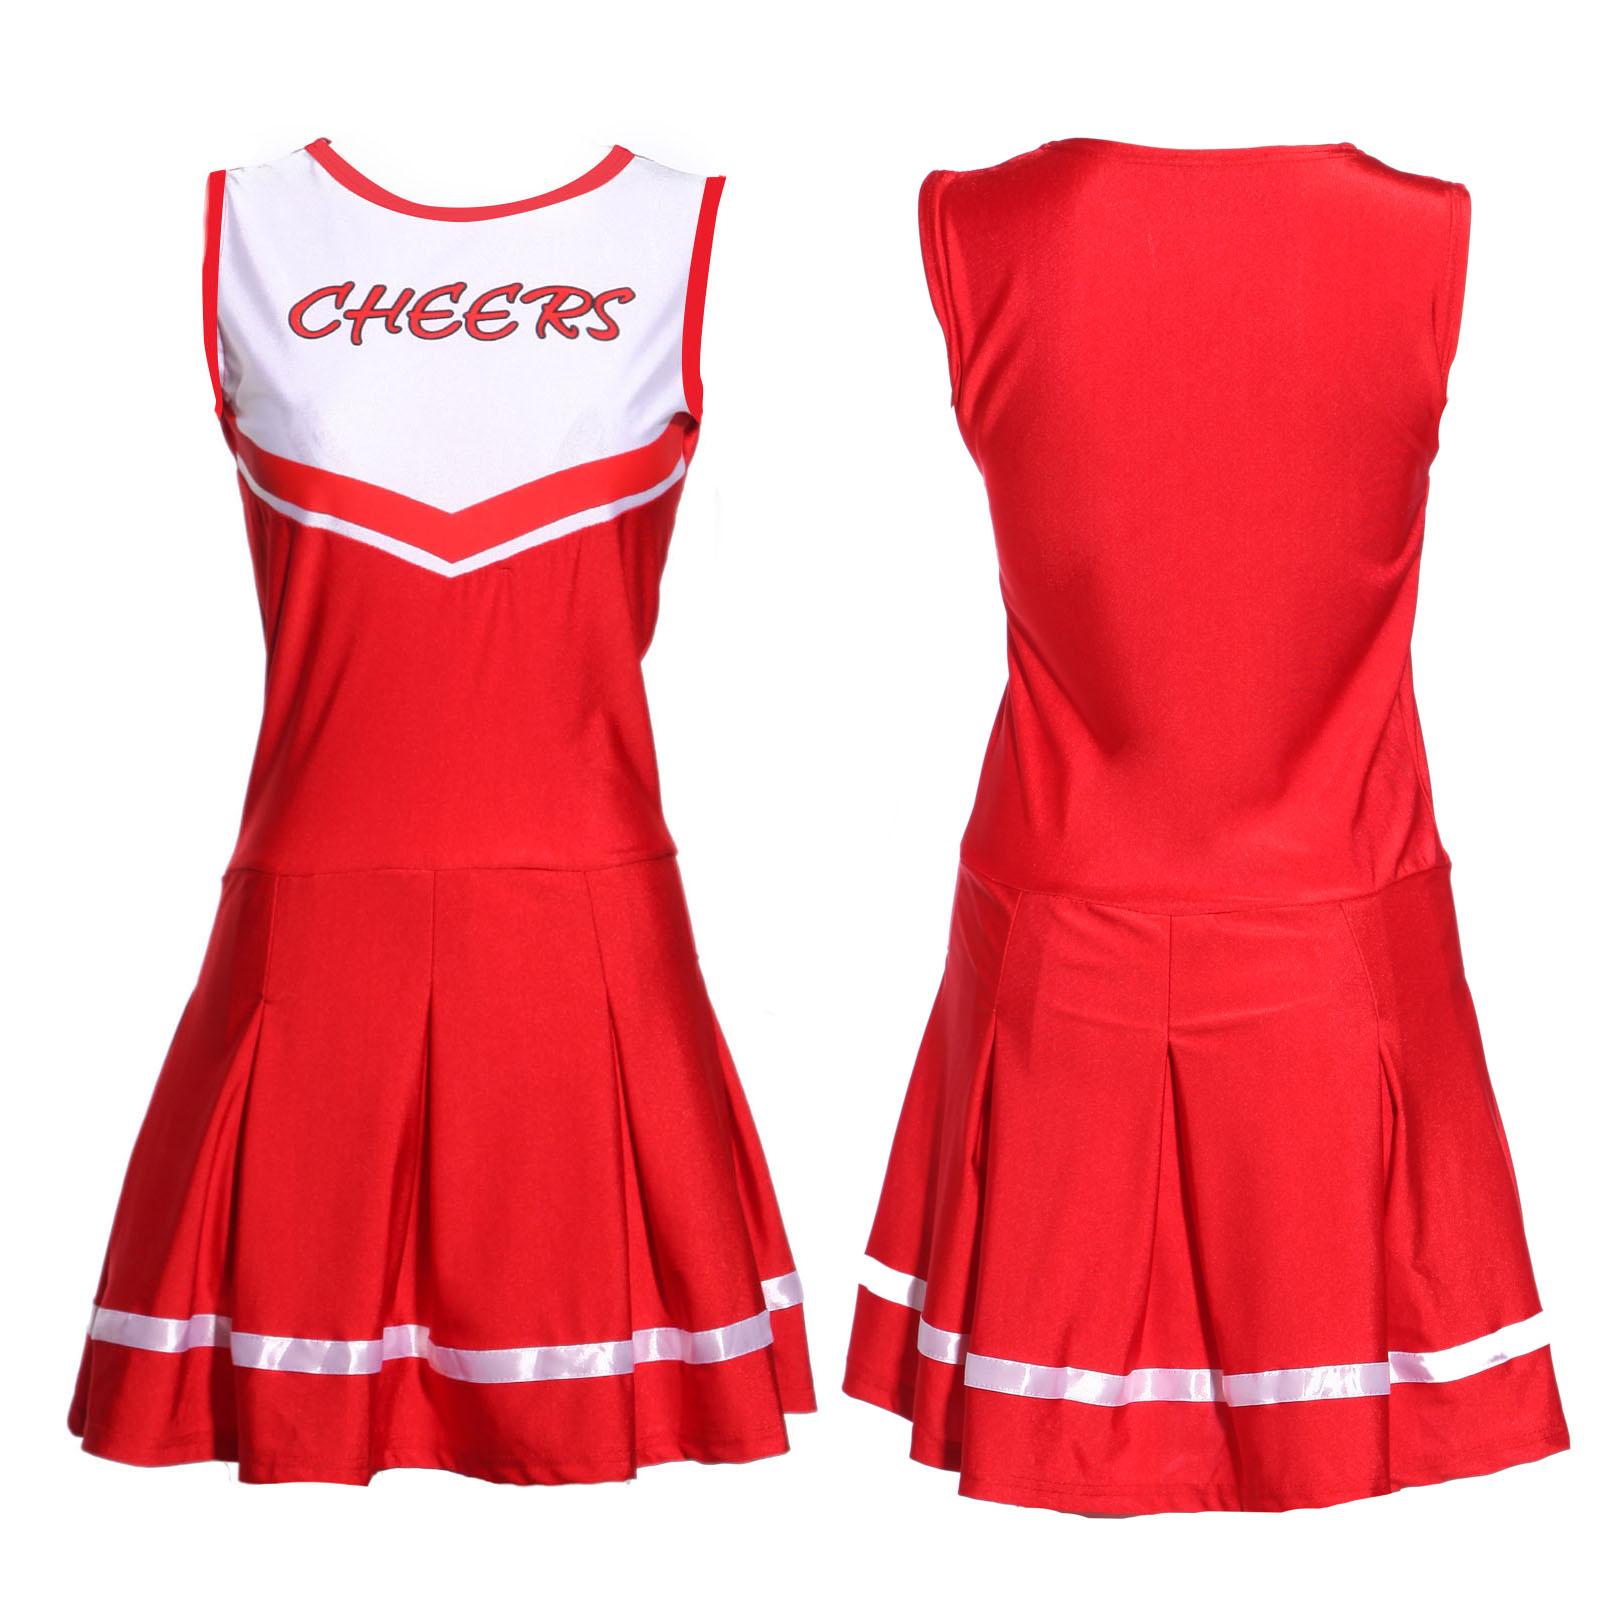 Carnevale Cheerleader Costume + pom poms High School Stile Rosso   Bianco 8216e3603f9